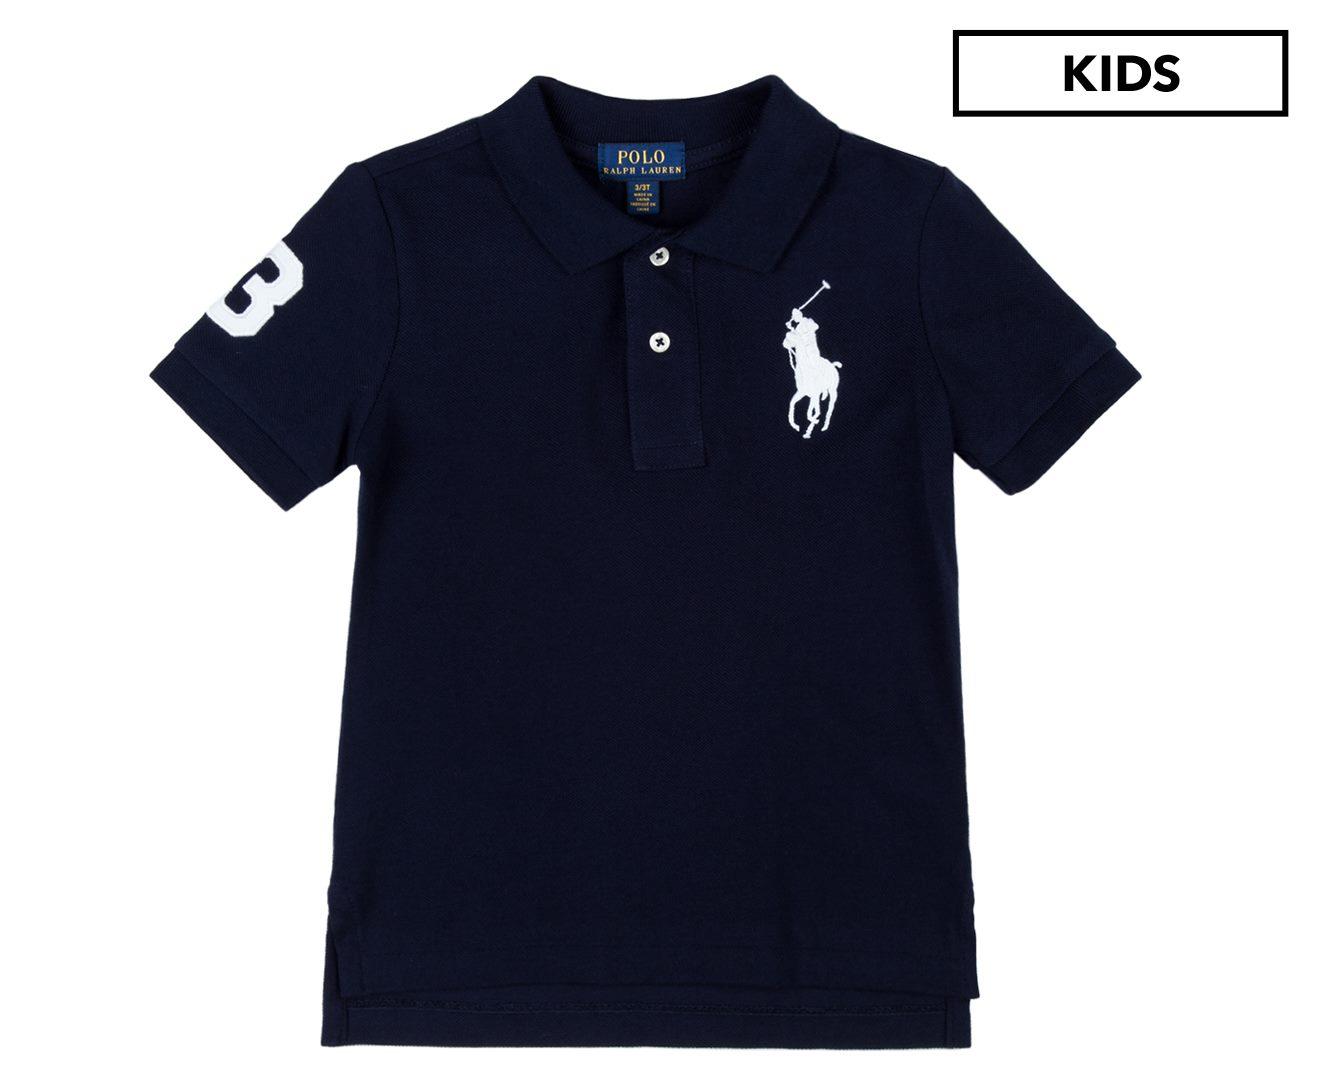 0047fbc1857 Polo Ralph Lauren Kids  Big Pony Mesh Polo French Navy Polo Shirt ...